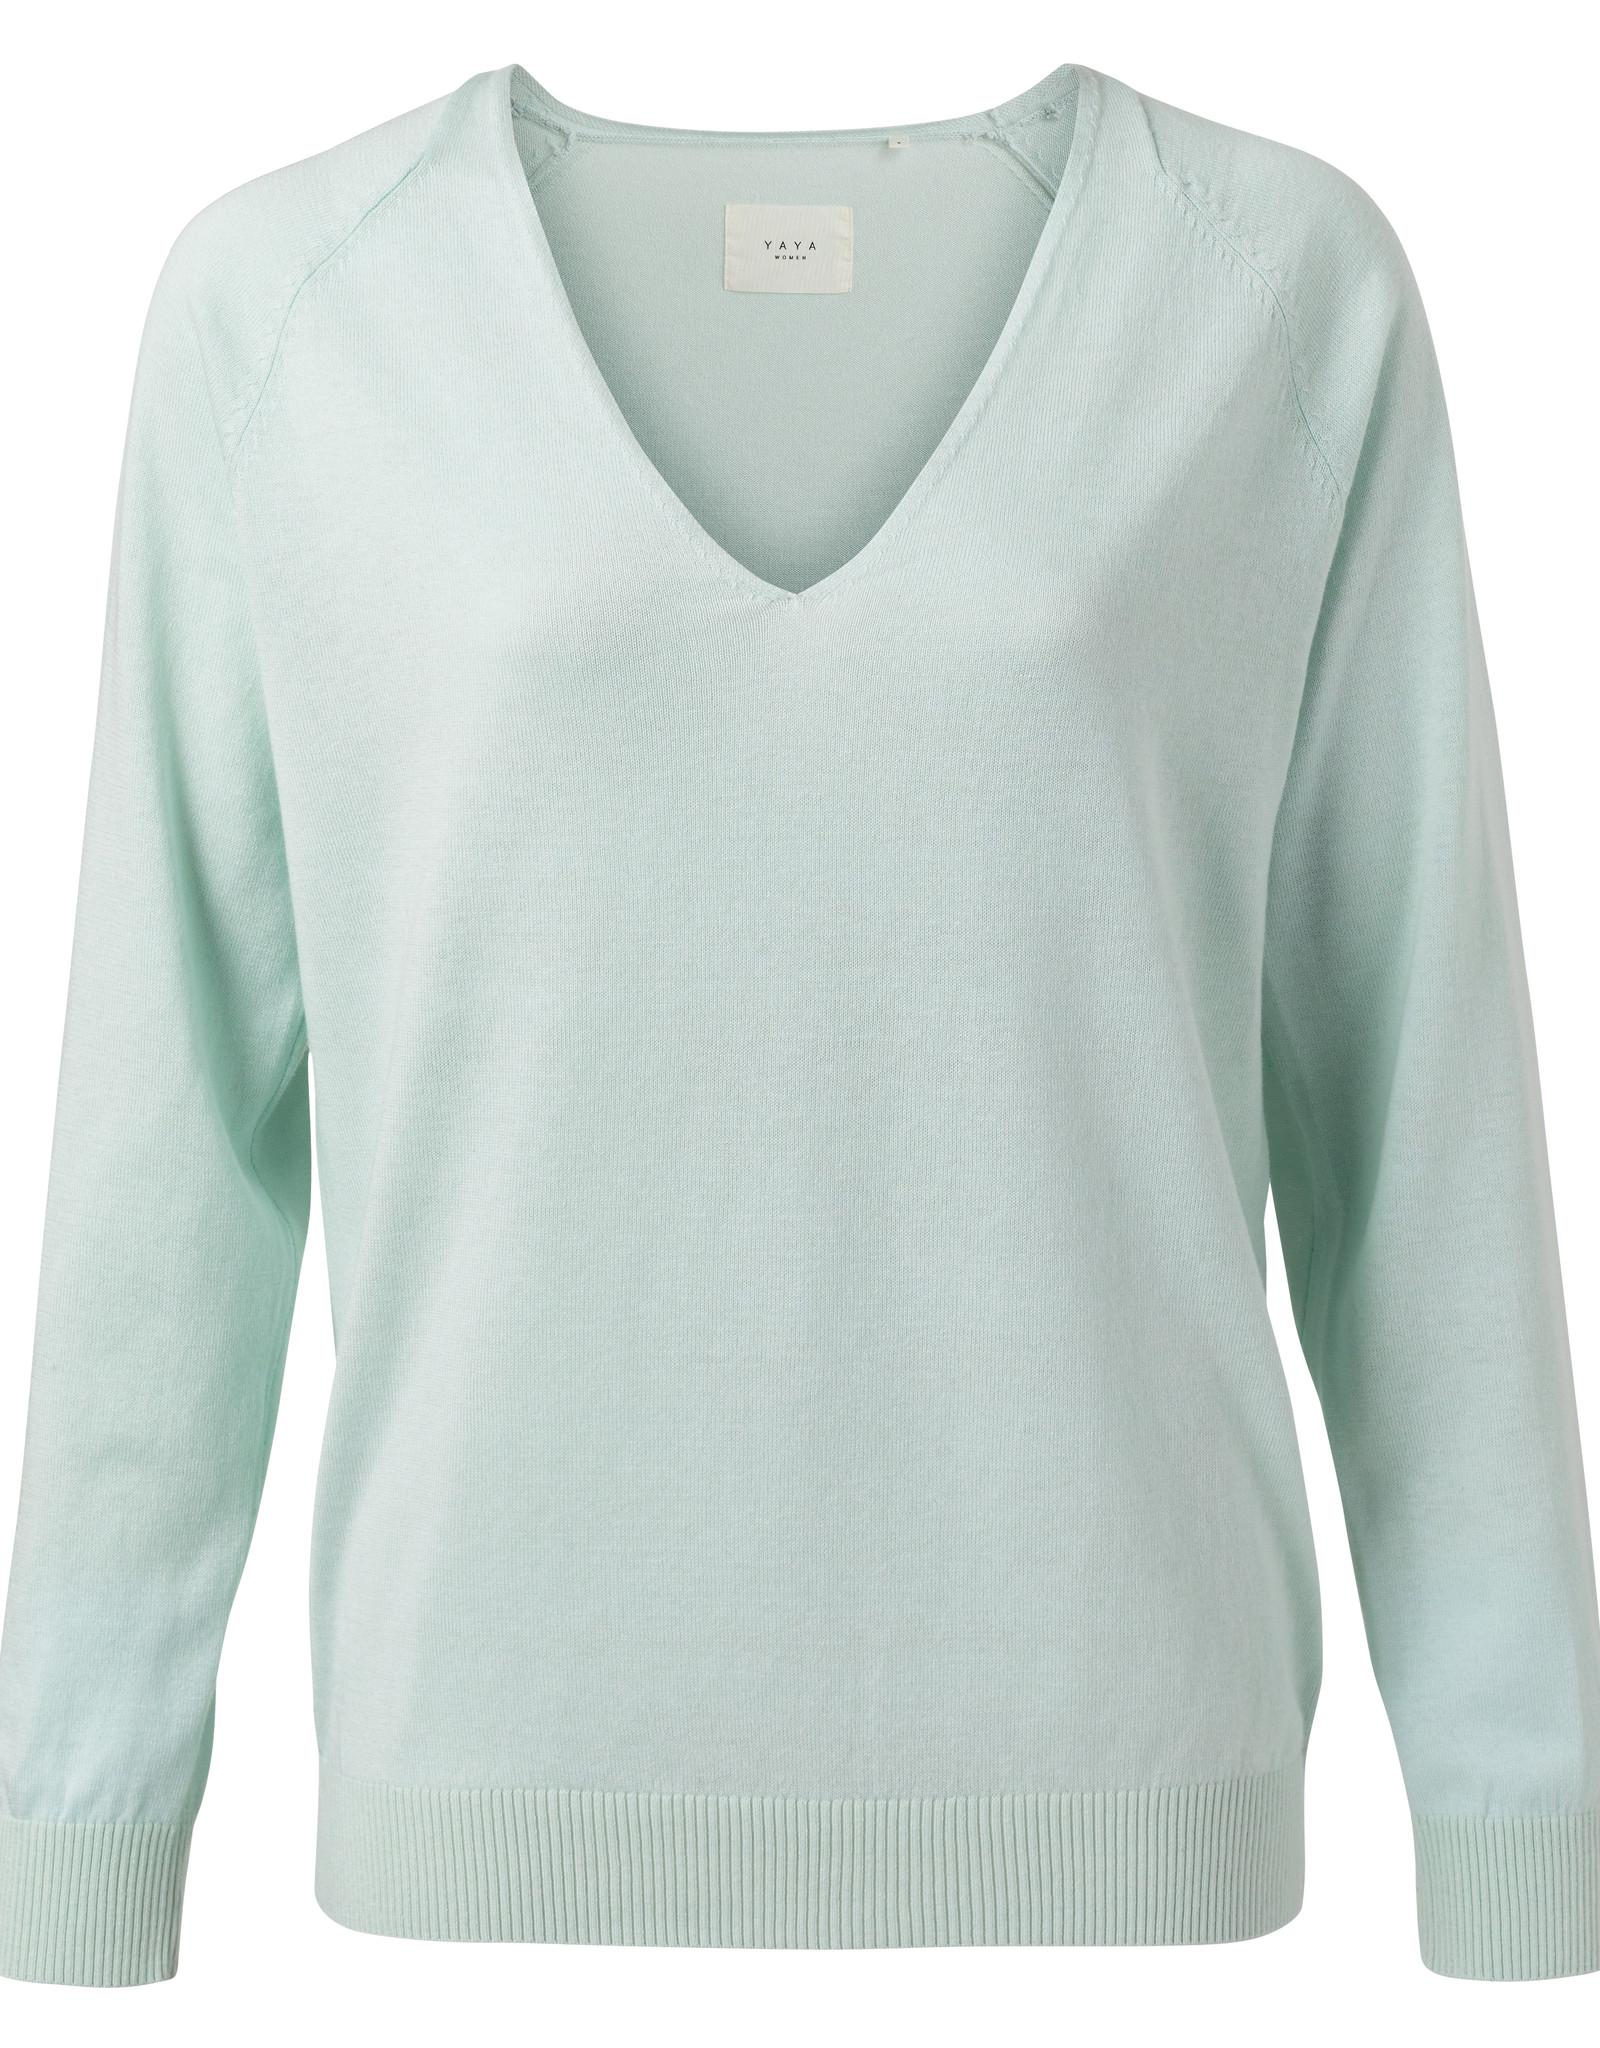 Yaya Brittany Sweater